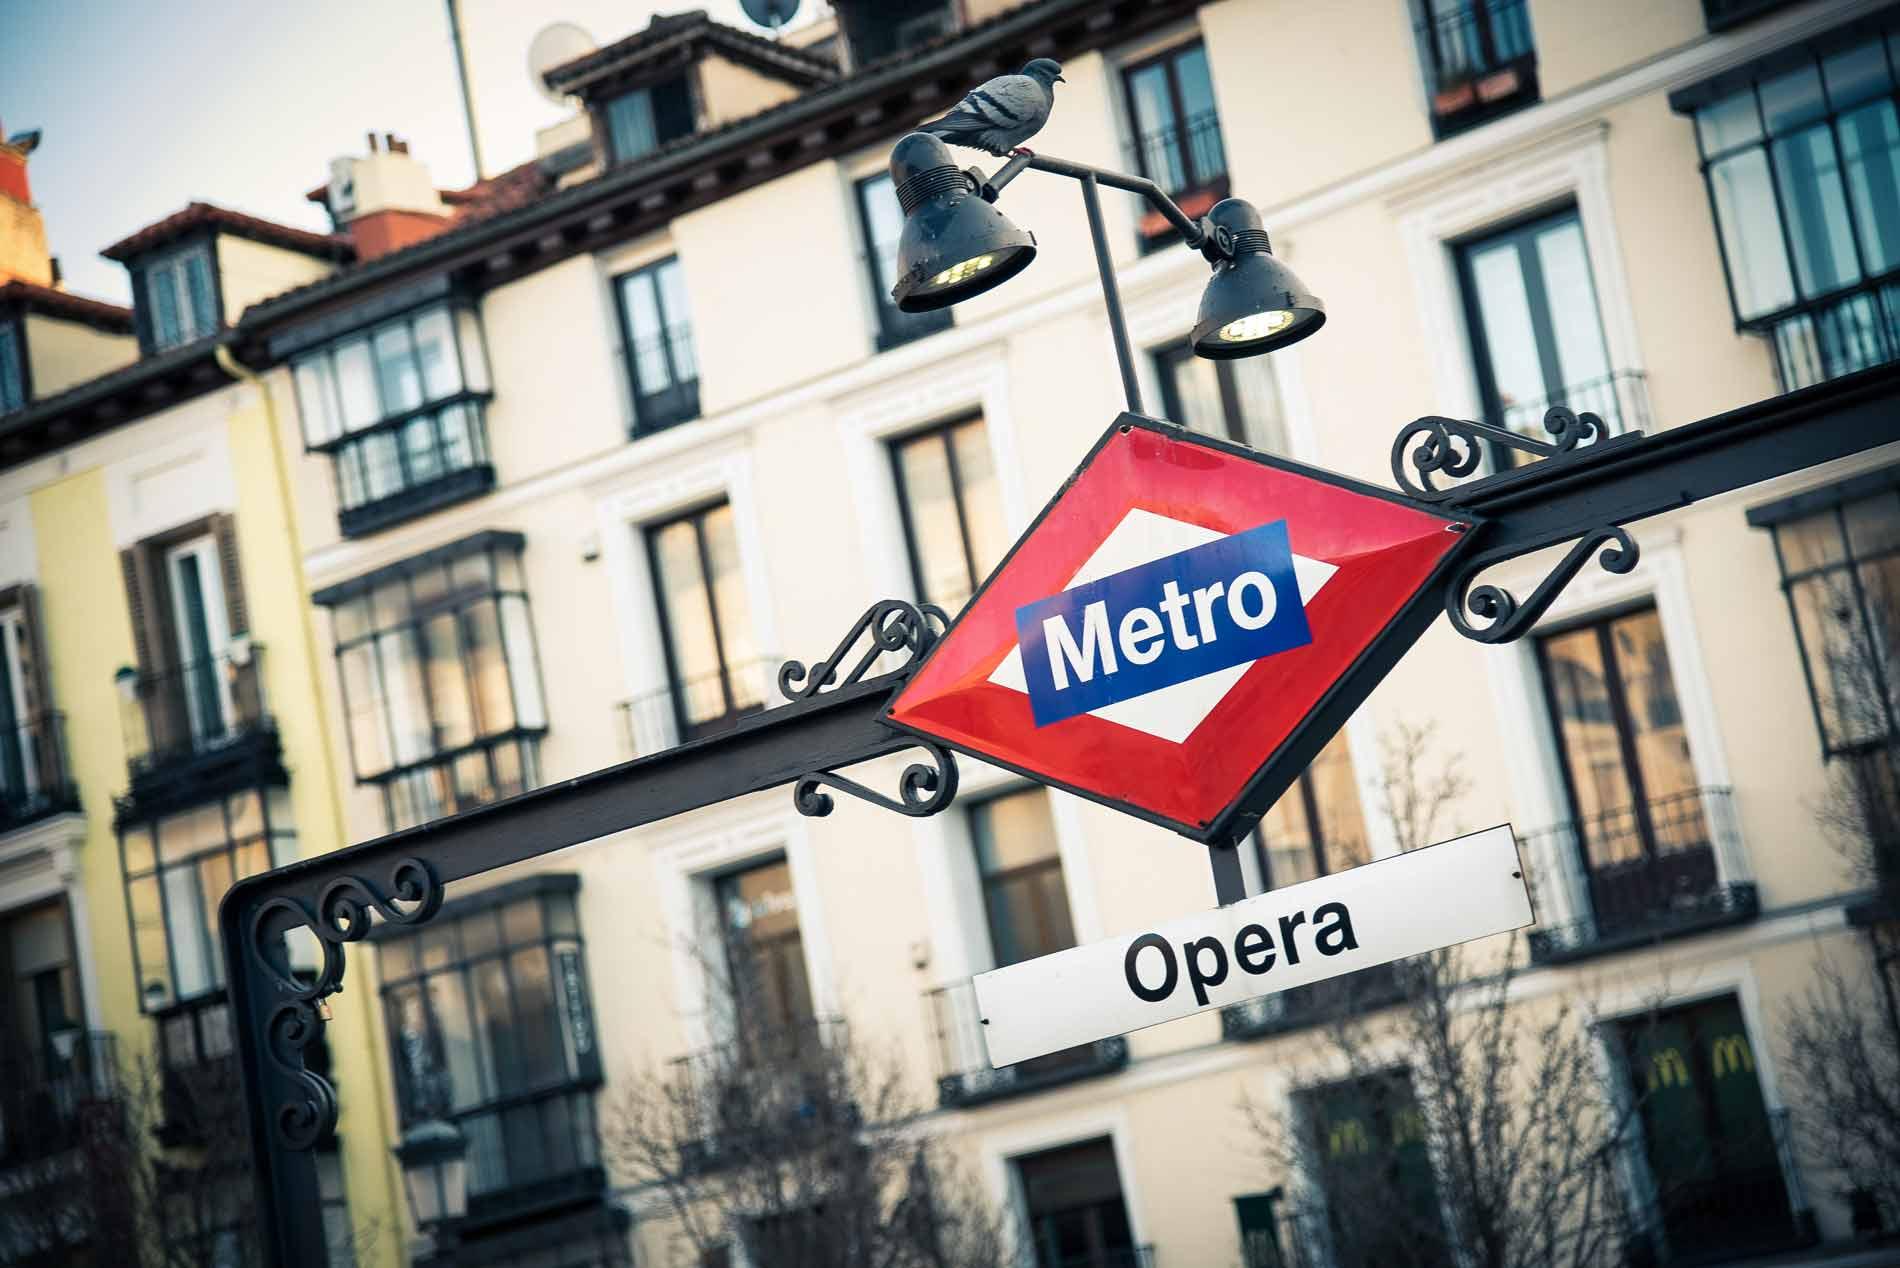 Guía para salir por Madrid, por estación de metro